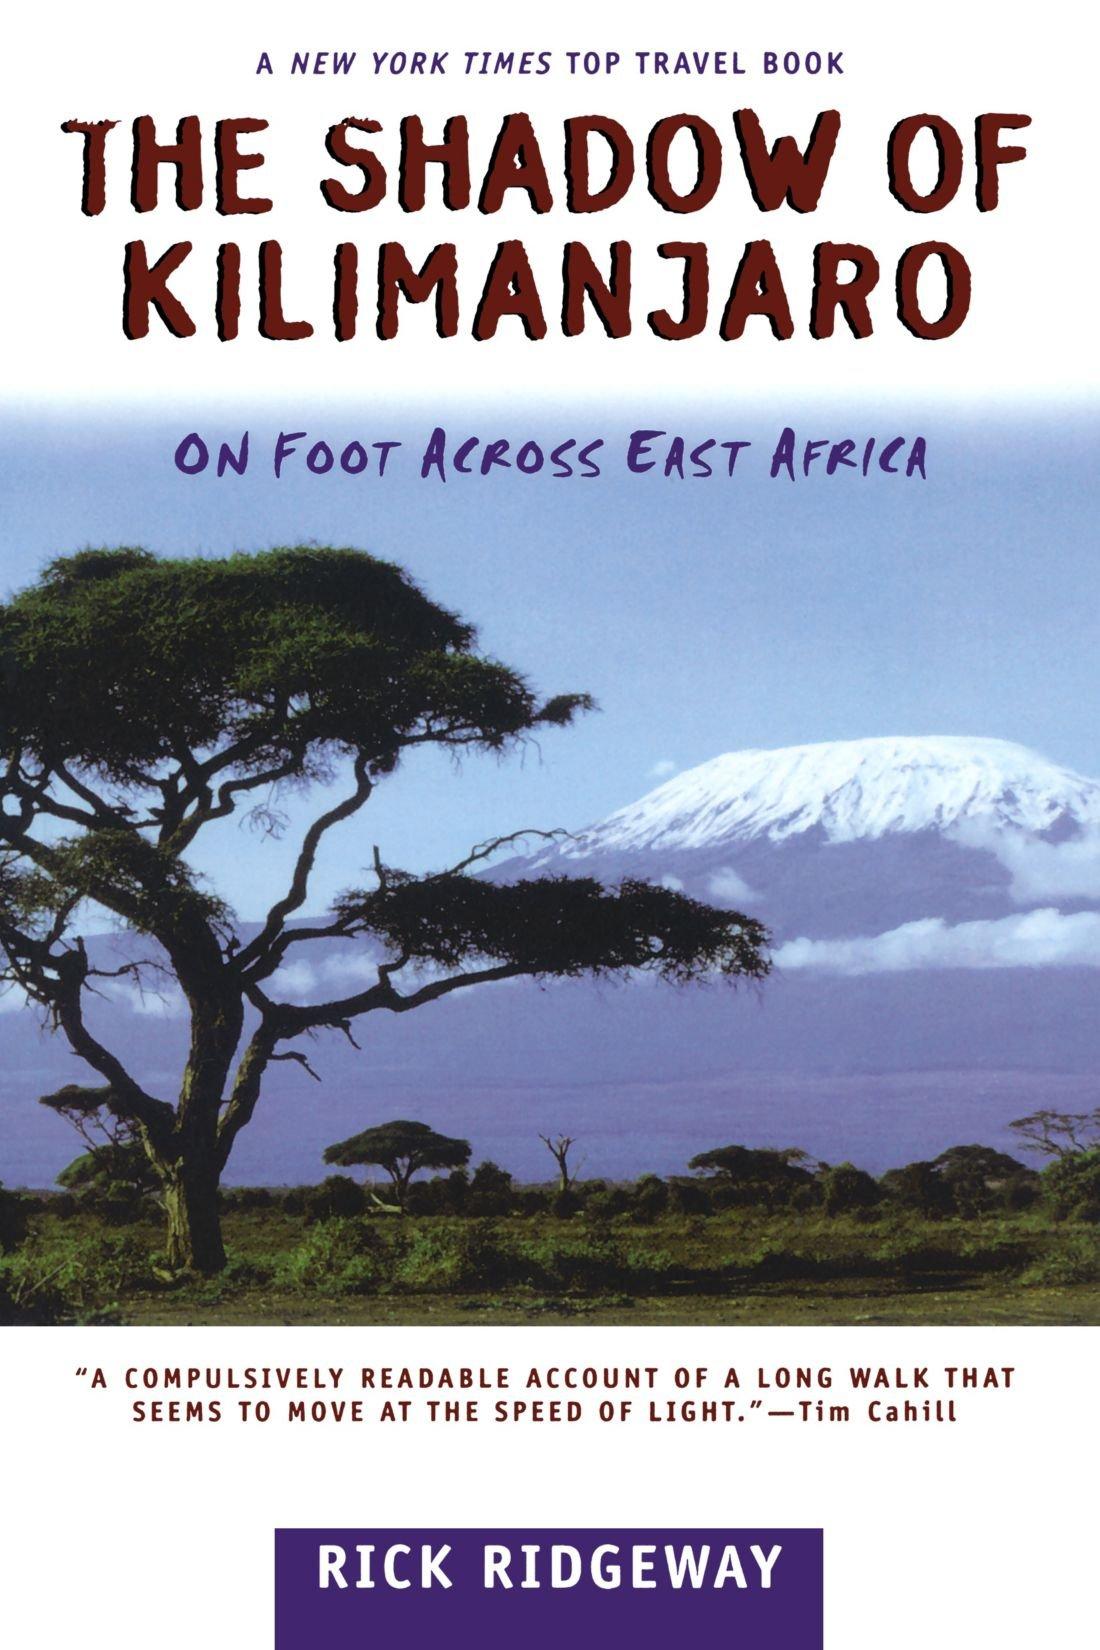 The Shadow Of Kilimanjaro: Rick Ridgeway: 9780805053906: Amazon: Books